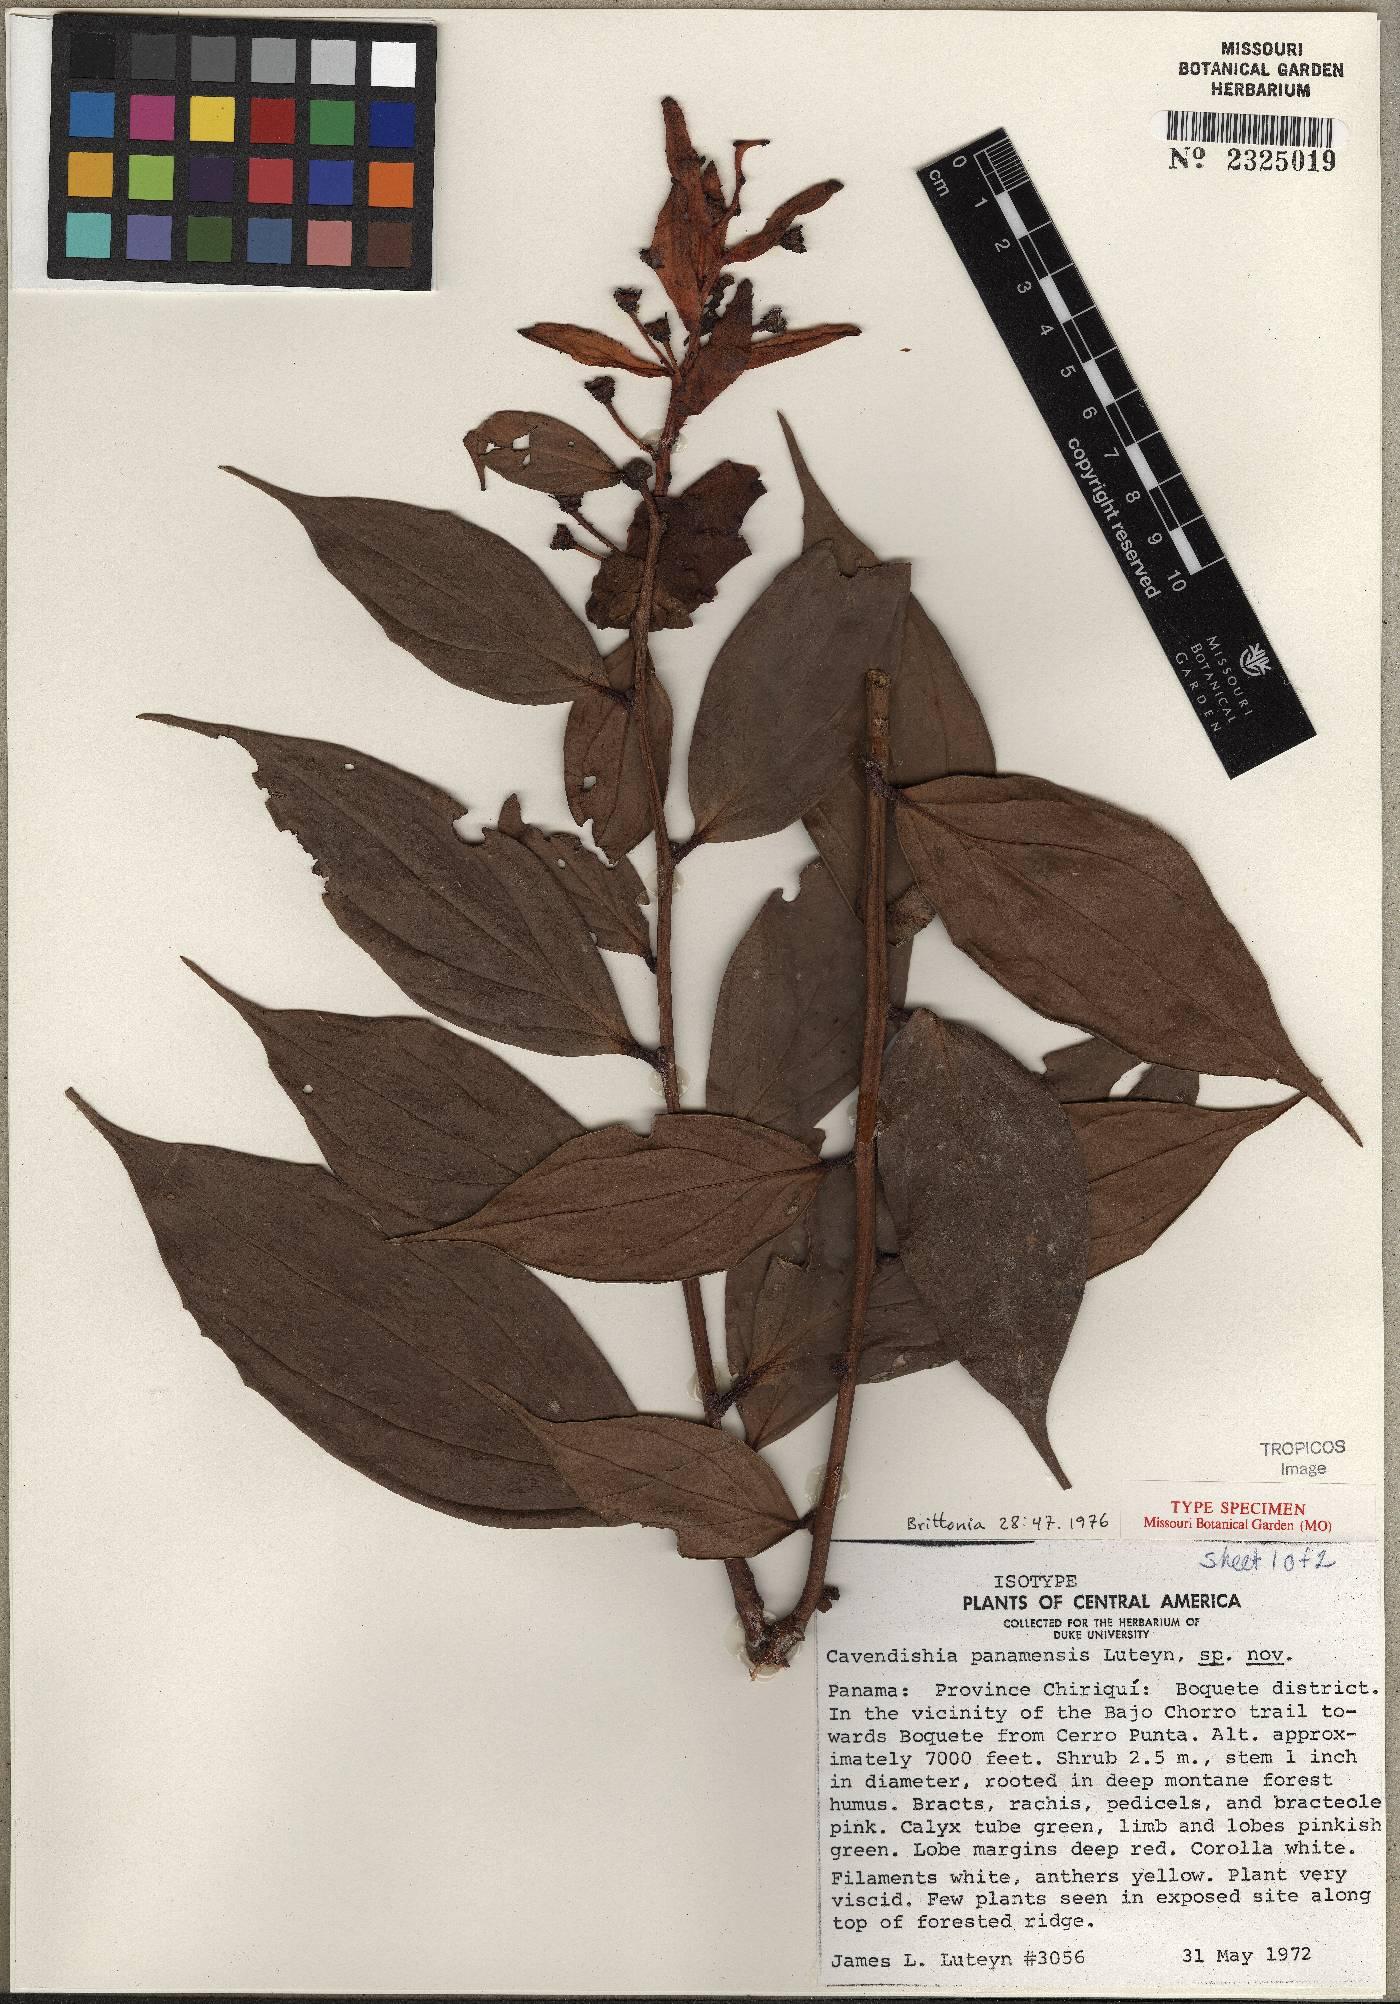 Cavendishia panamensis image